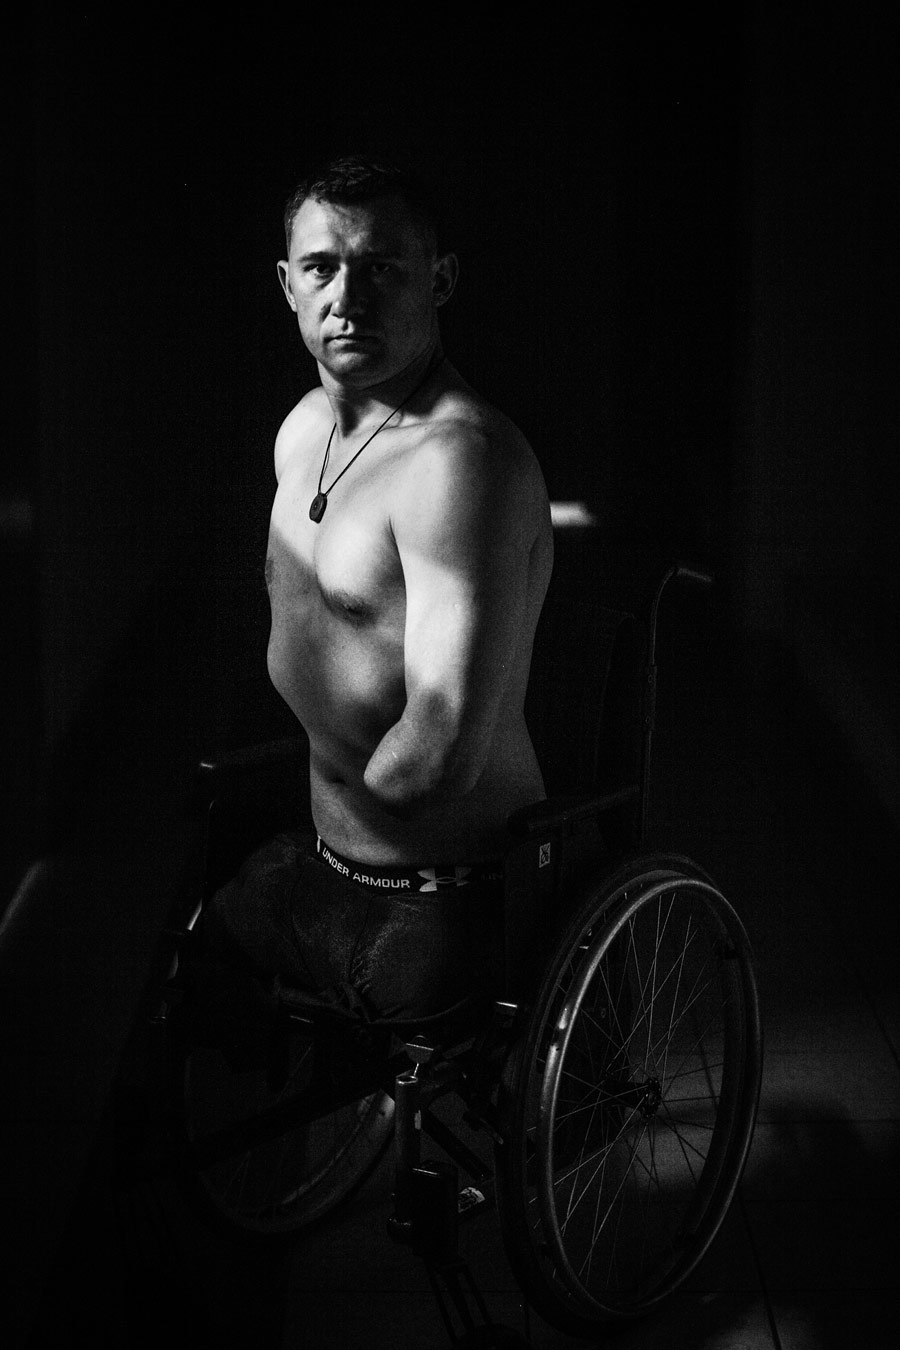 The Story Of Talai / Belarus, © Pavel Volkov / Vechernaya Moskva Newspaper, Russia, Story Sports 1st Prize, Istanbul Photo Awards